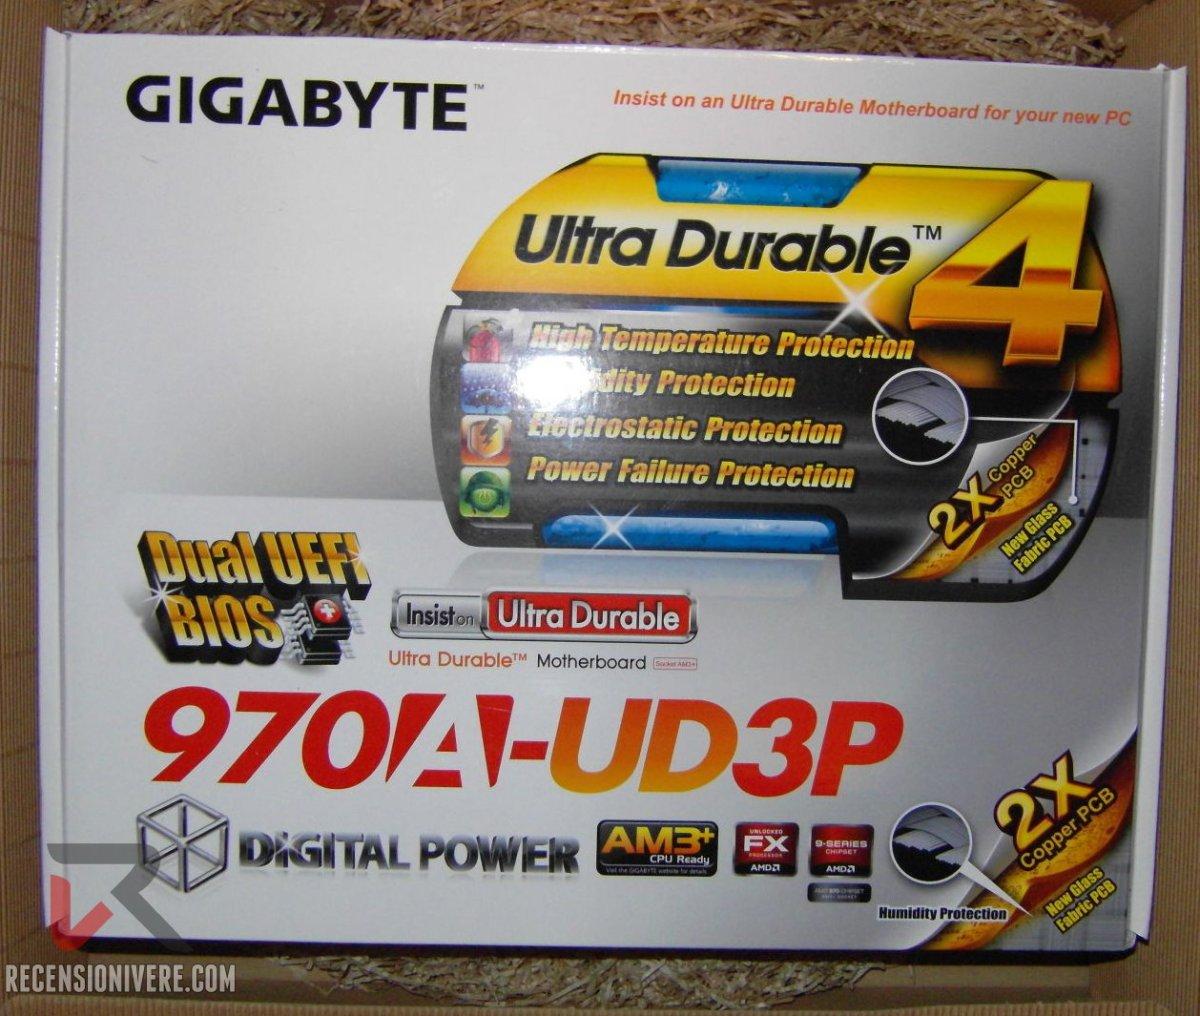 recensionivere_GA-970A-UD3P_003